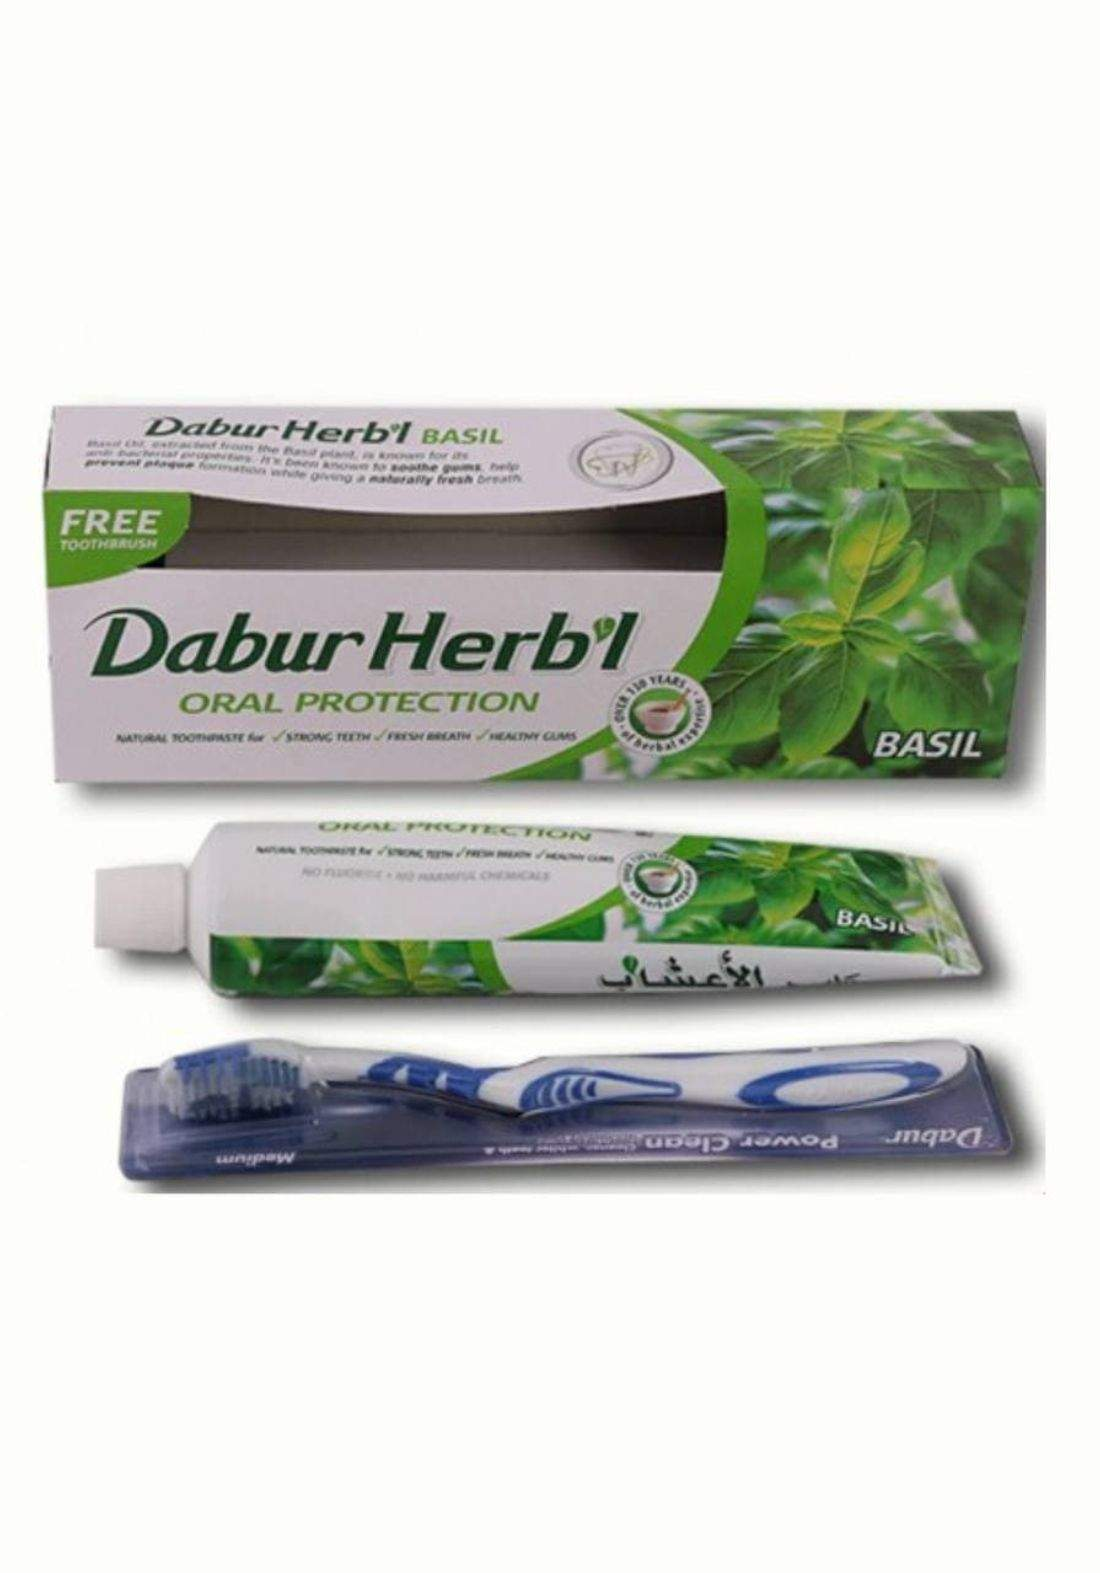 Dabur herbl tooth paste 150g معجون اسنان